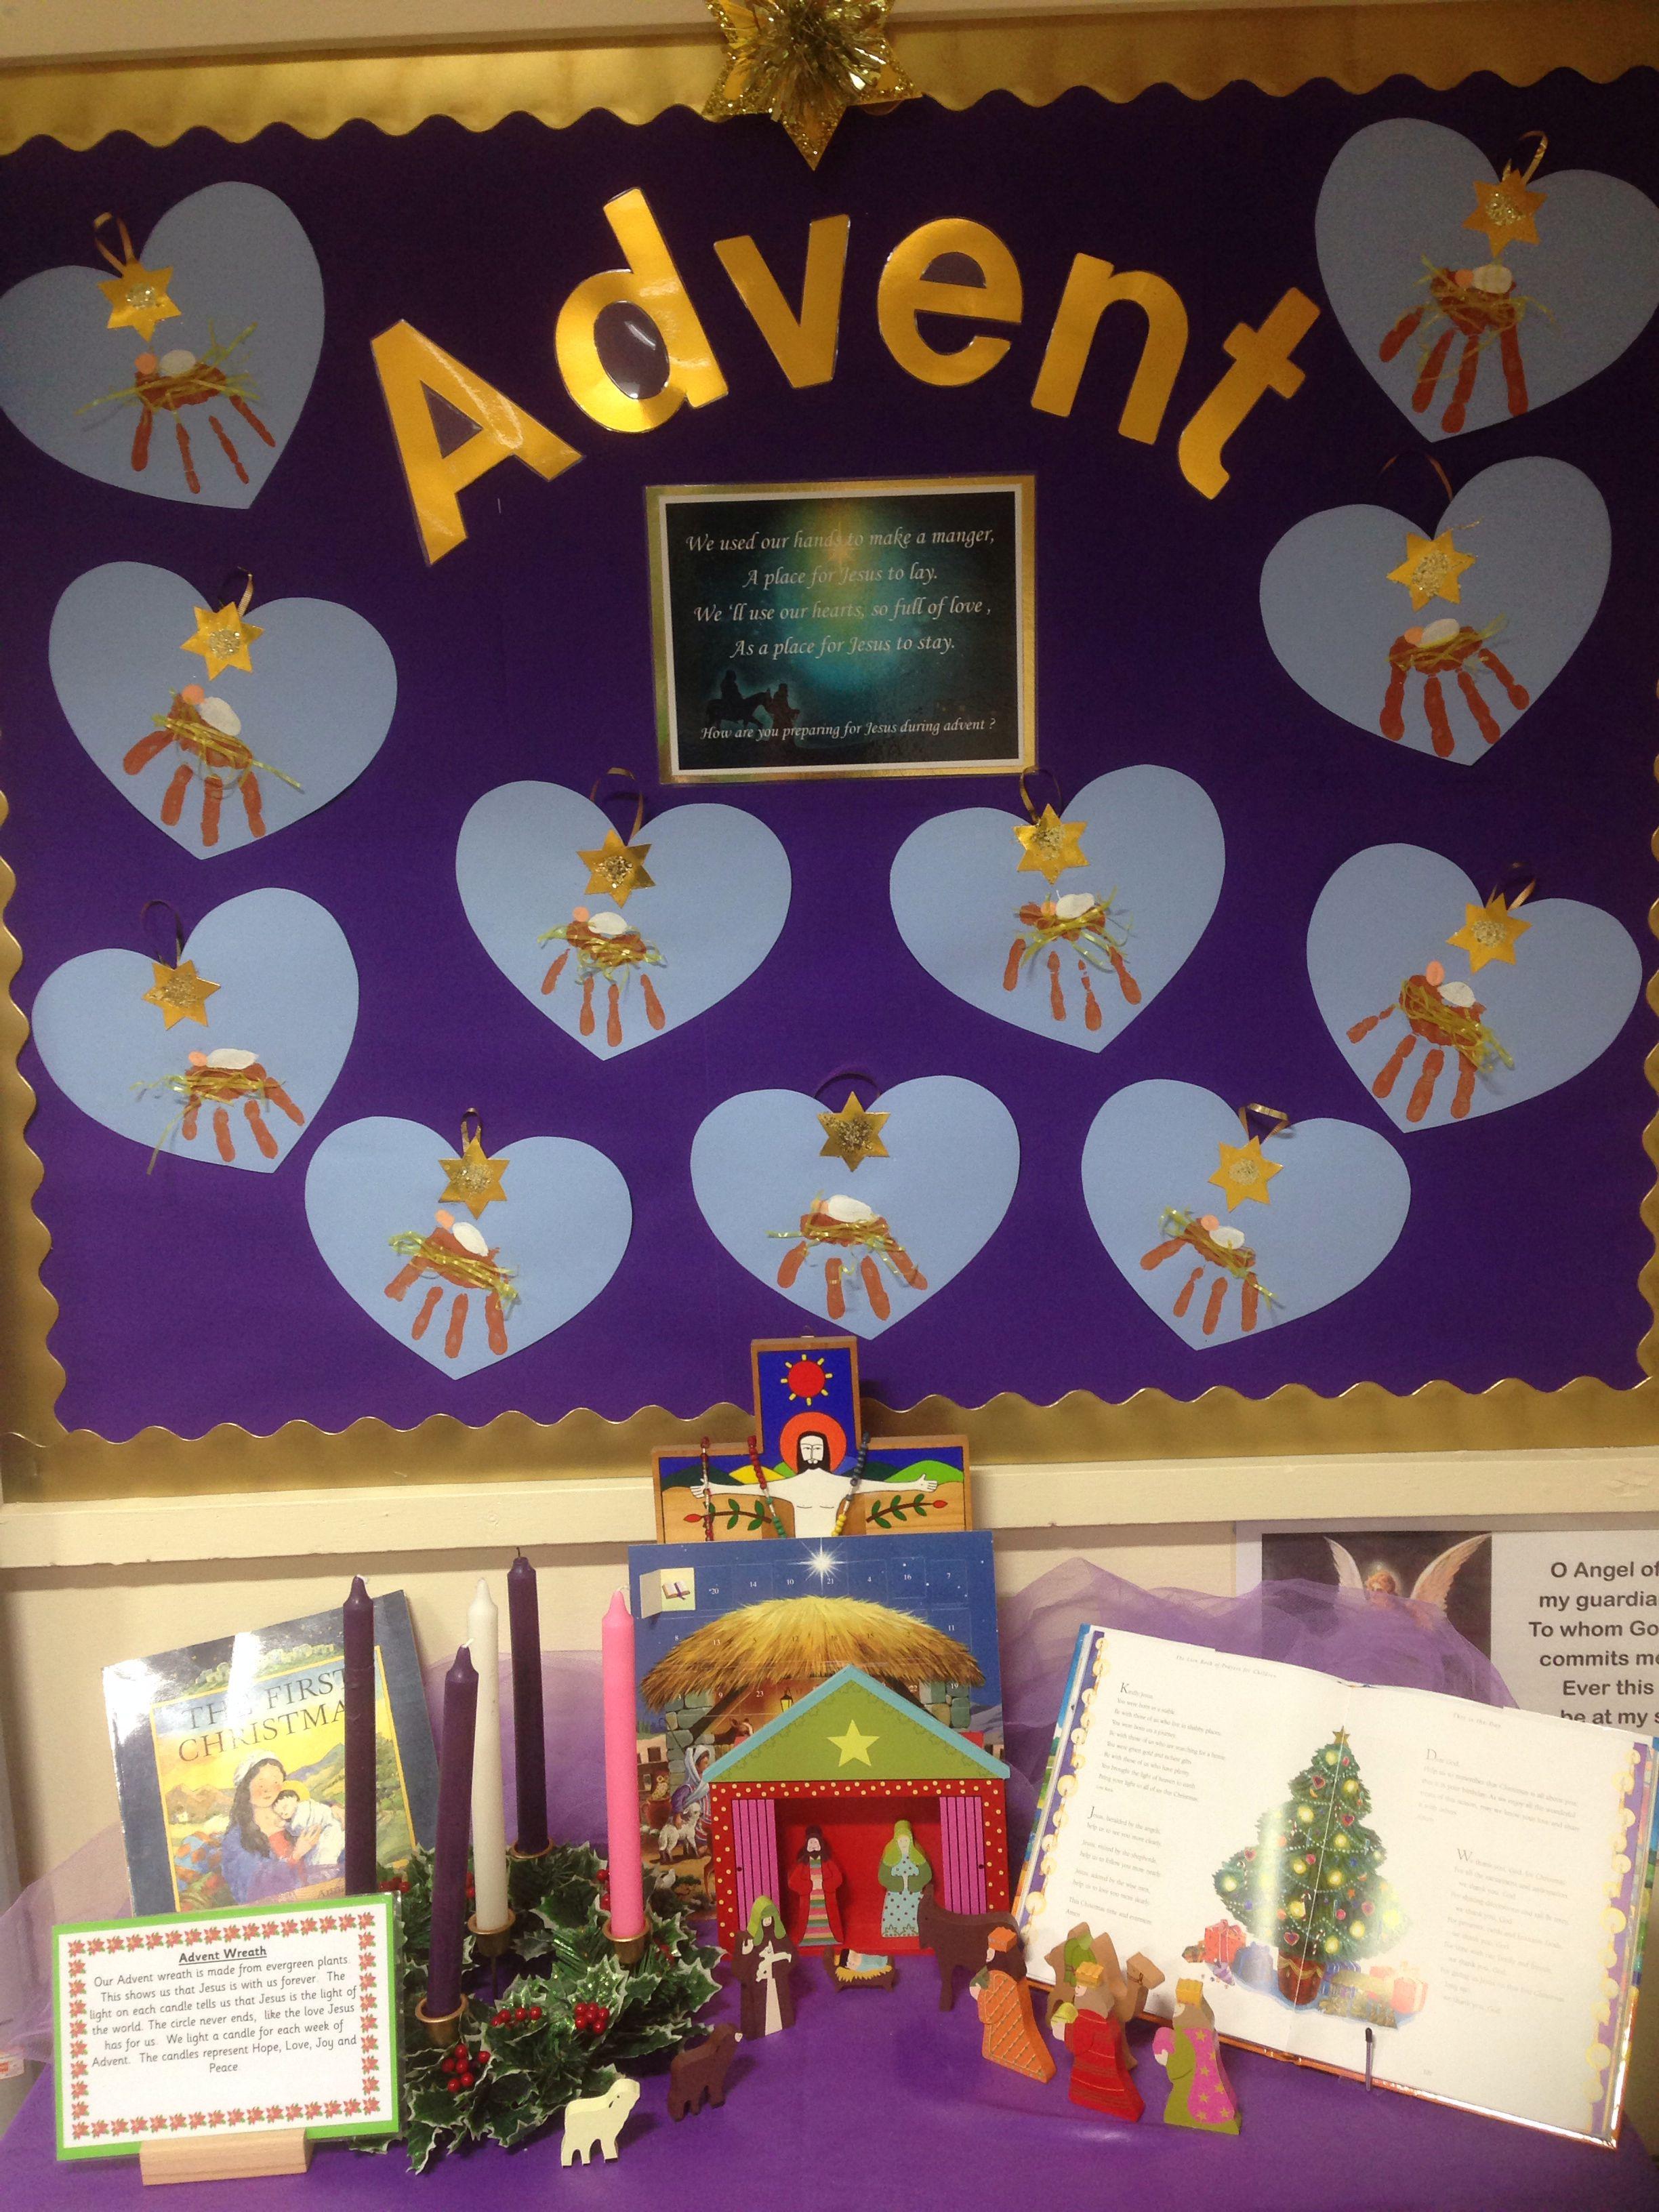 27 Advent and Christmas Service Ideas - Brainstorm List ... |Worship Service Advent Ideas